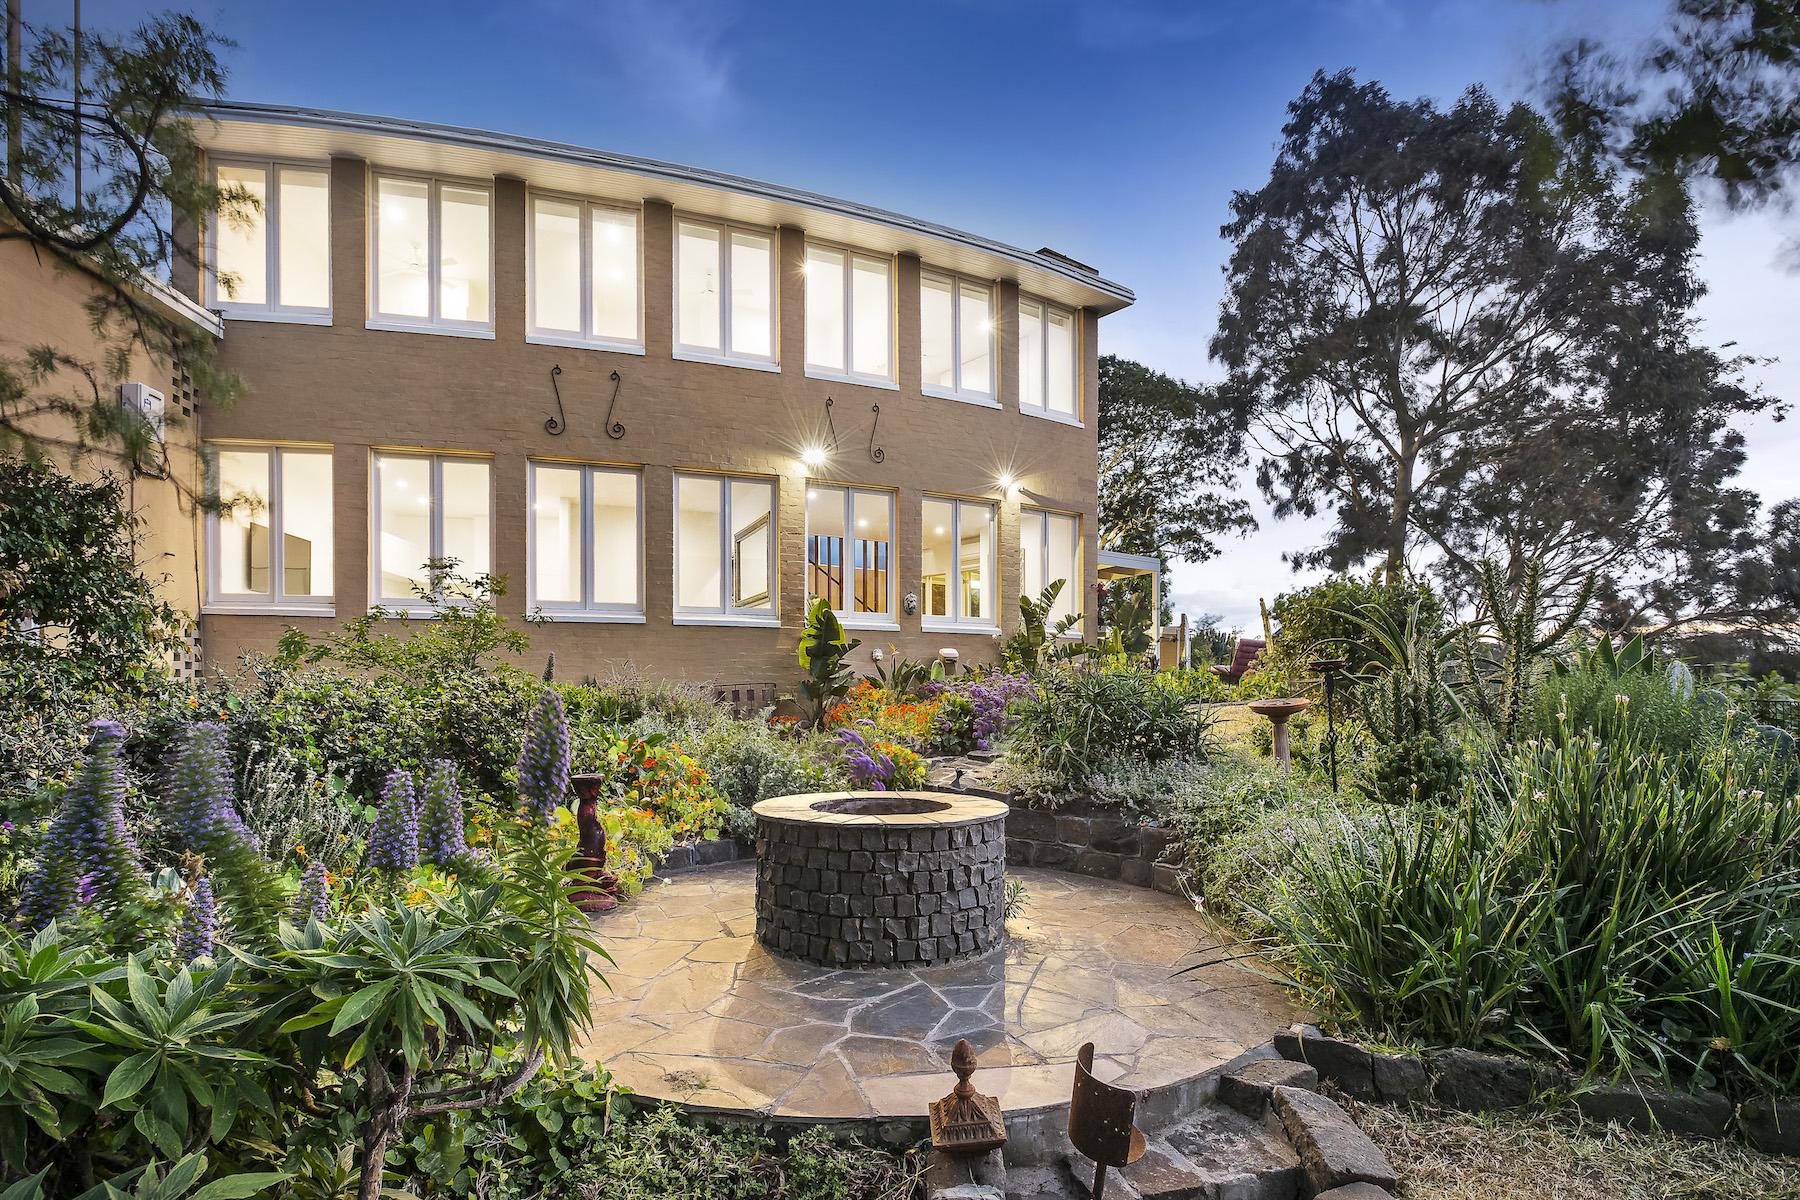 Tek Ailelik Ev için Satış at Residence 1 at 3 Glover Court, TOORAK Melbourne, Victoria, 3142 Avustralya